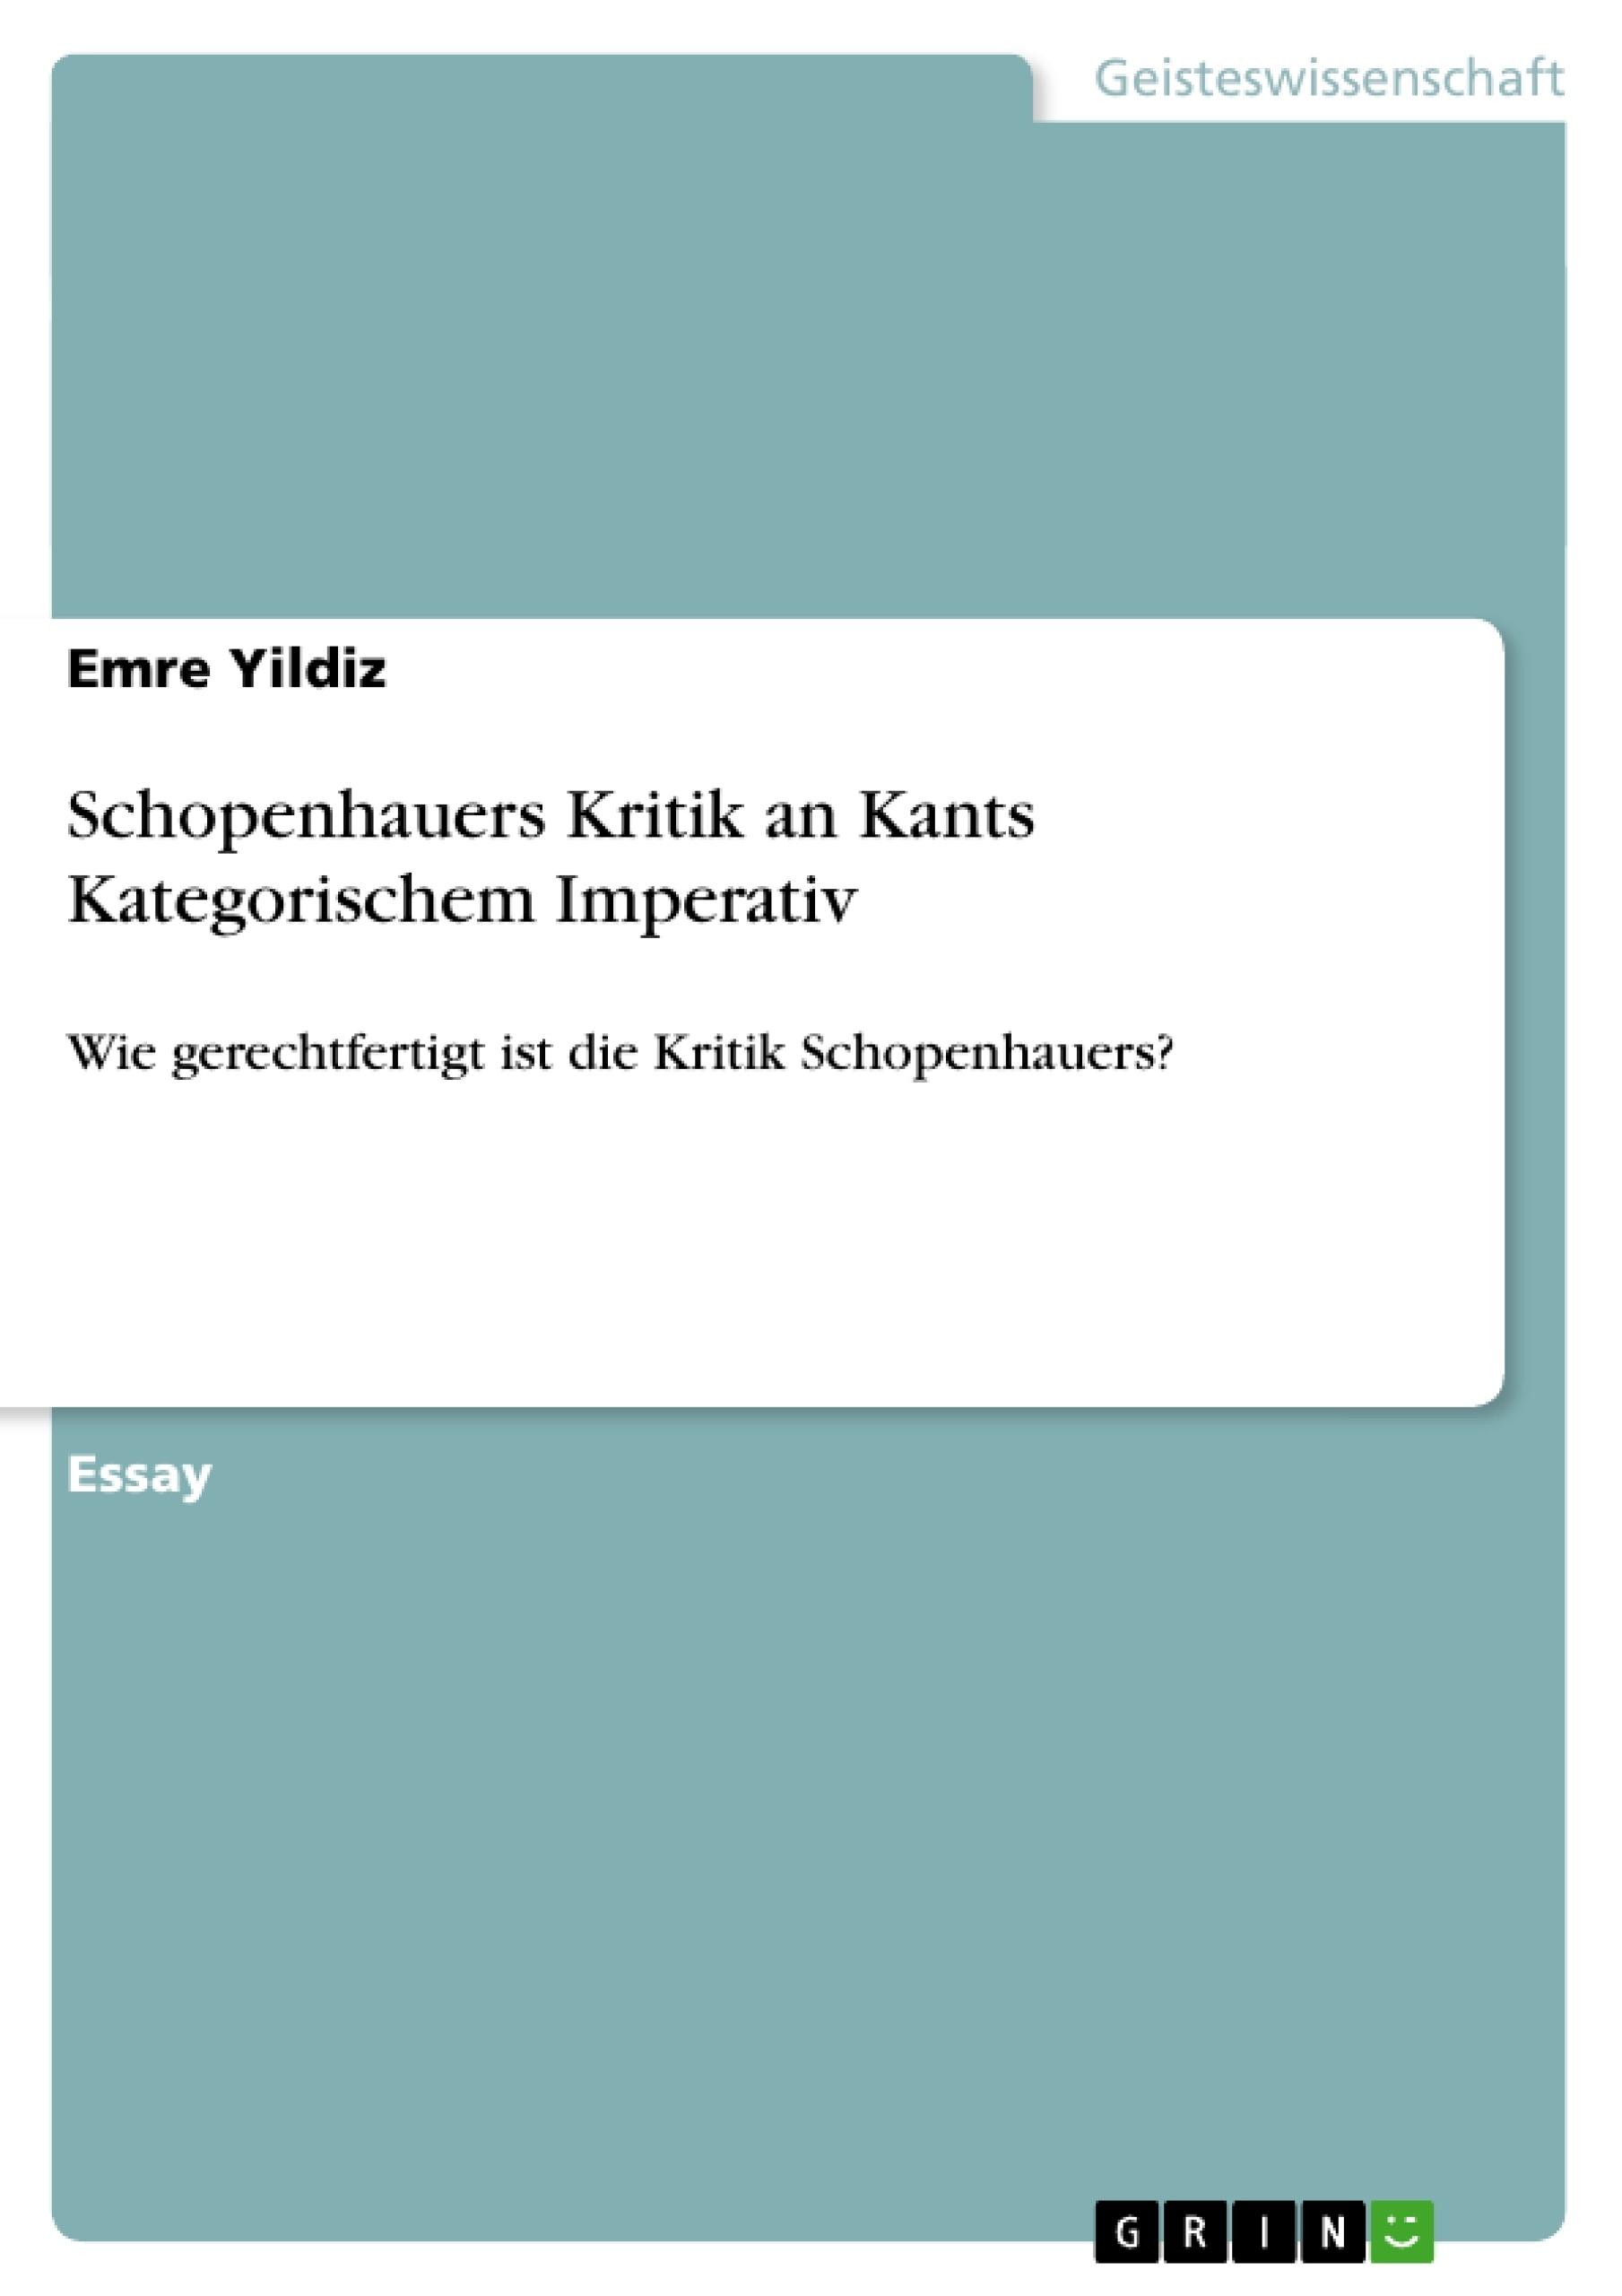 Titel: Schopenhauers Kritik an Kants Kategorischem Imperativ